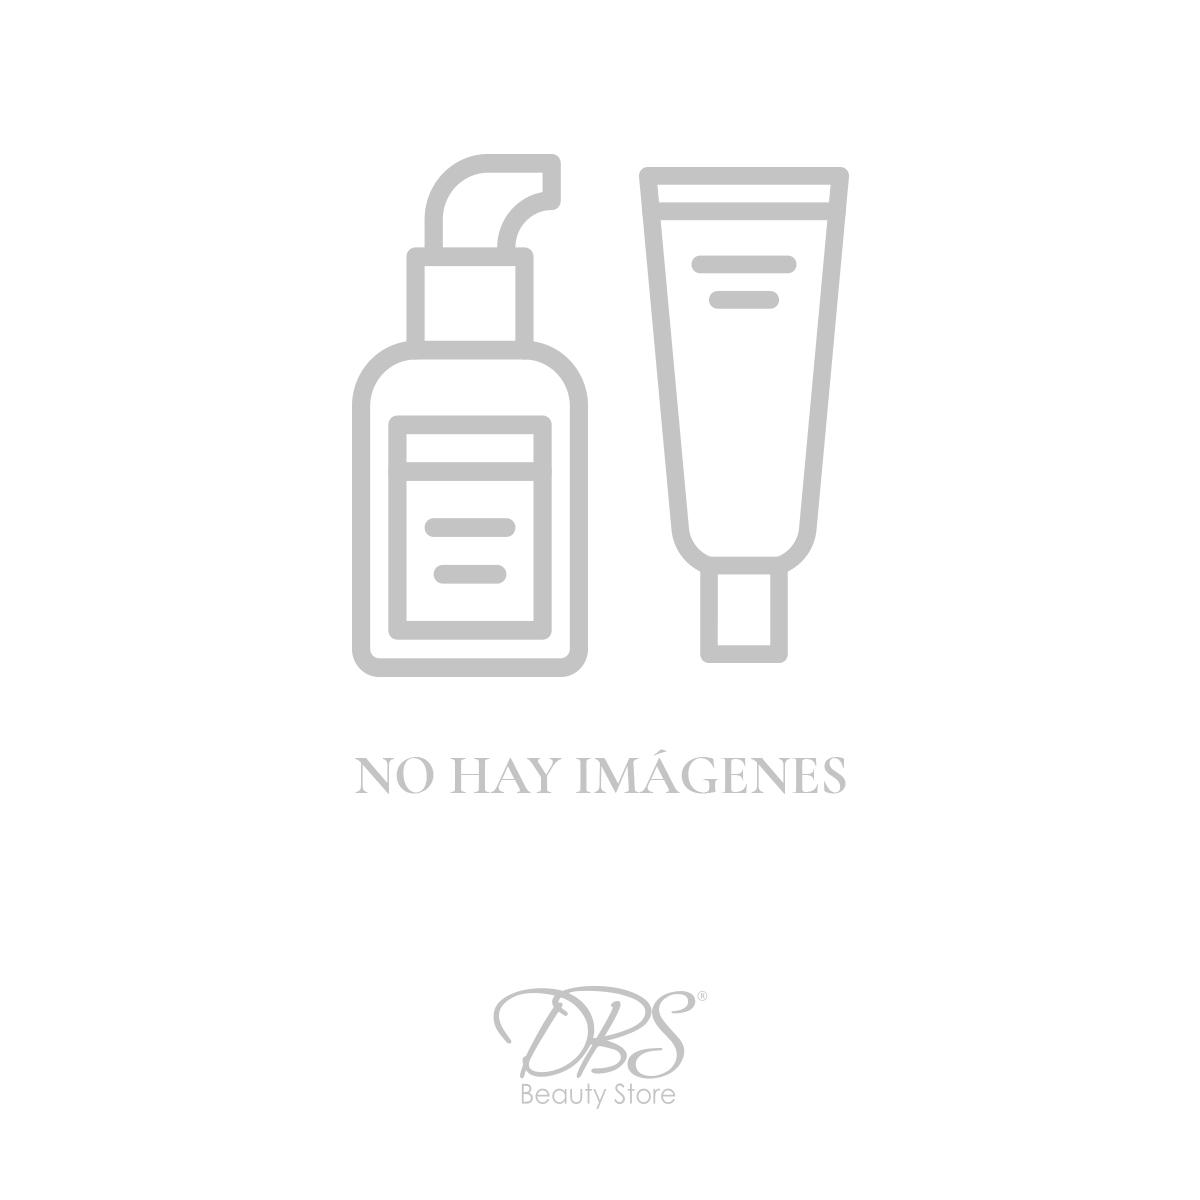 body-luxuries-BL-BN04138.jpg